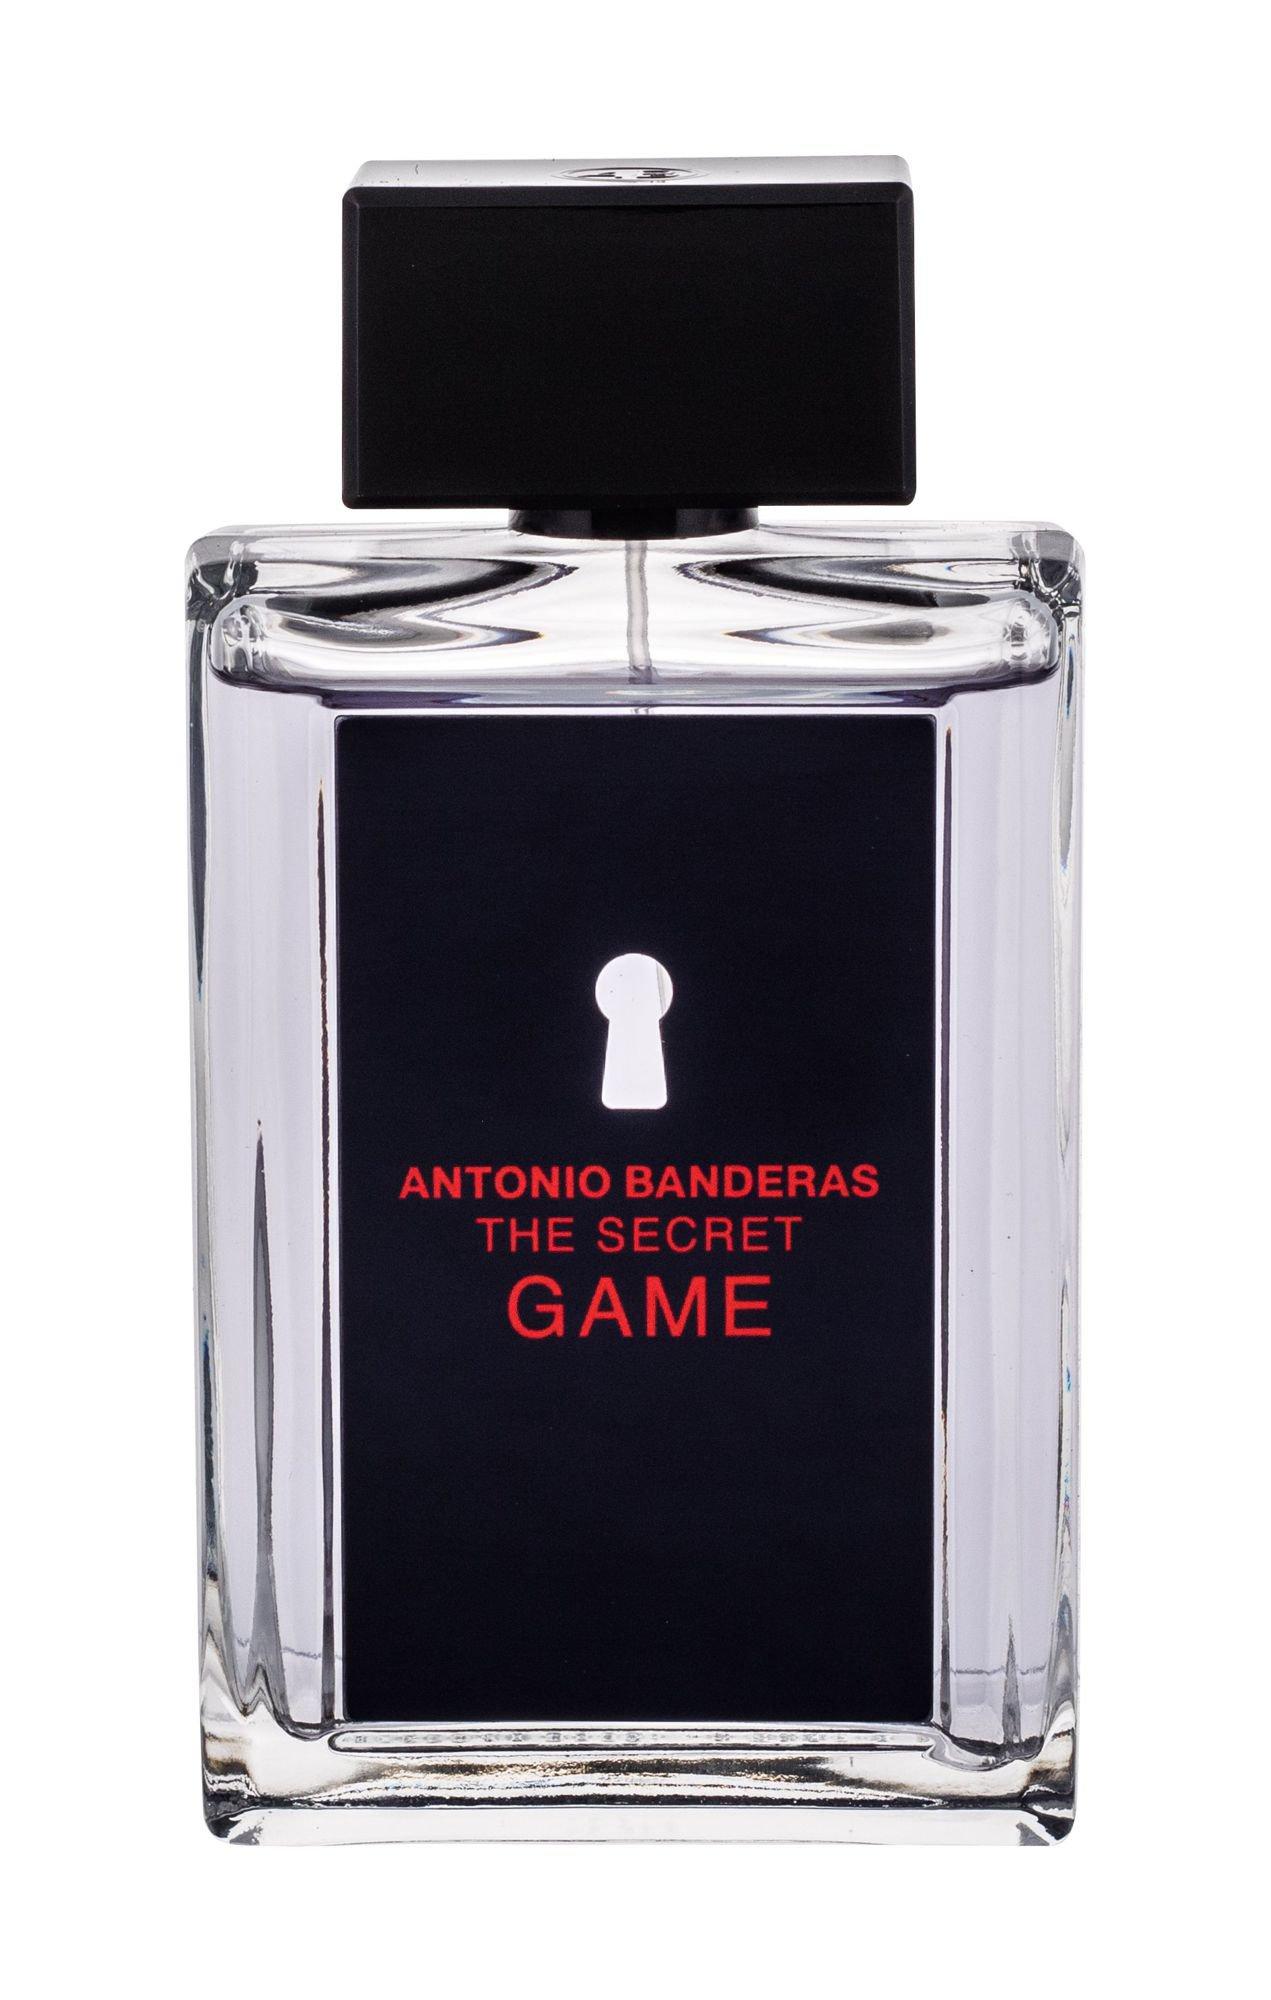 Antonio Banderas The Secret Game, Toaletná voda 100ml